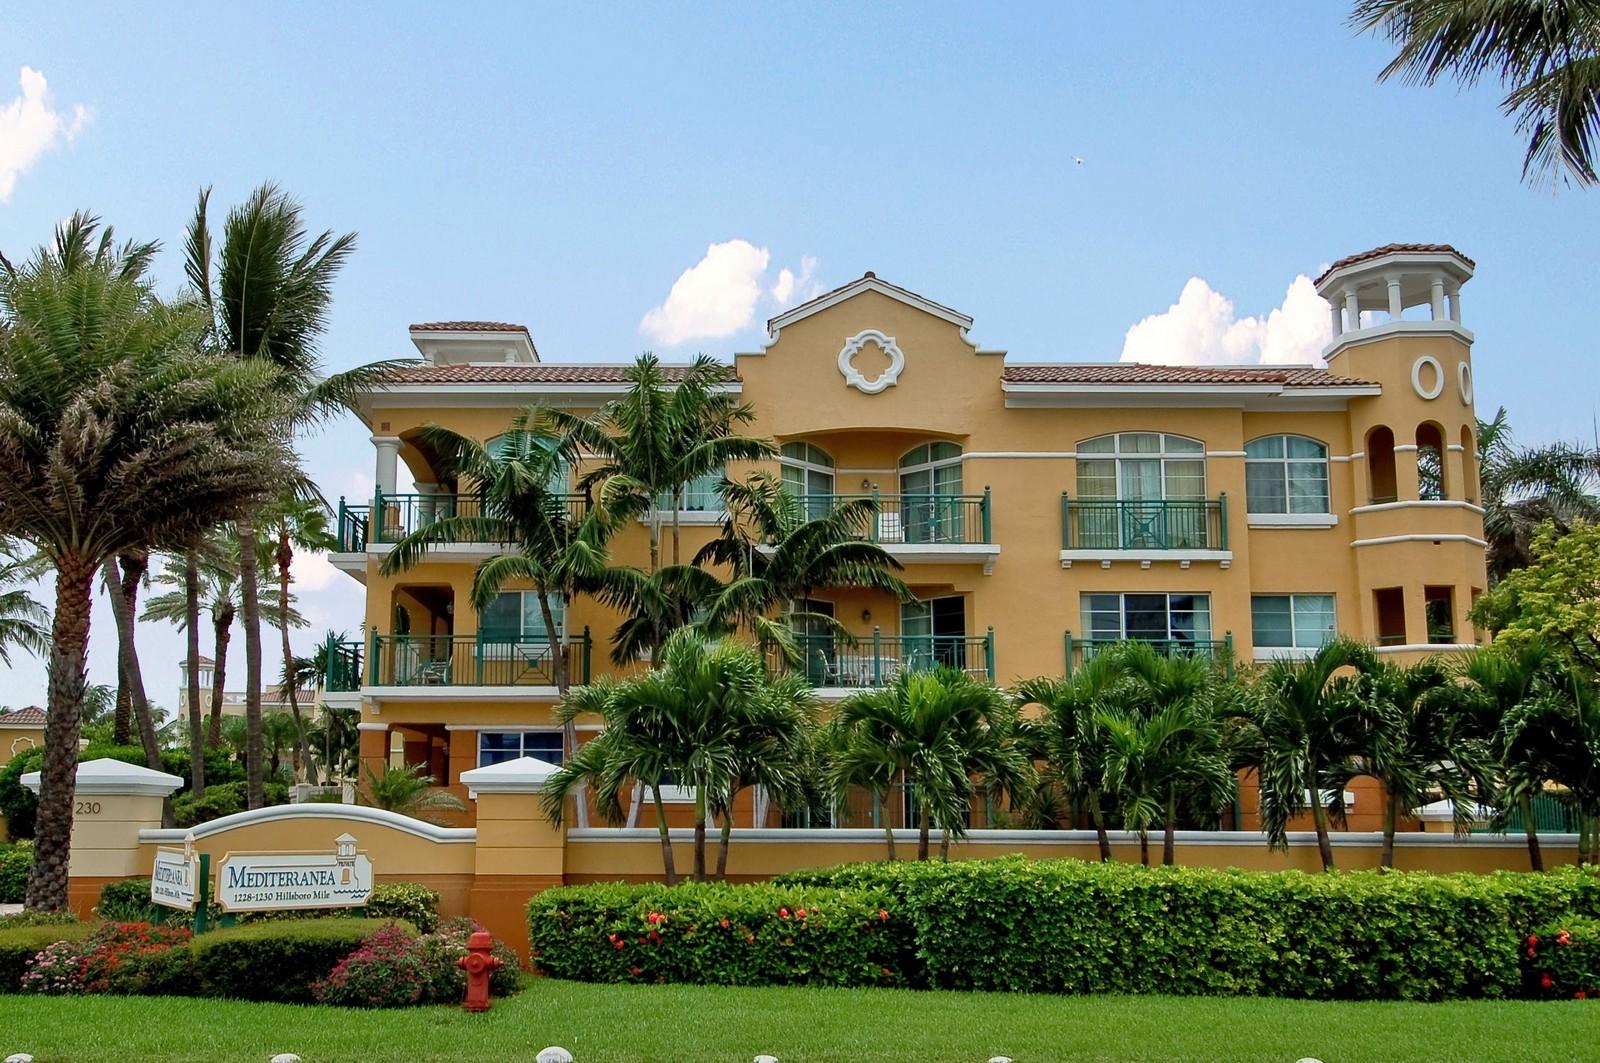 Real Estate Photography - 1230 Hillsboro Mile, Hillsboro Beach, FL, 33062 - Front View